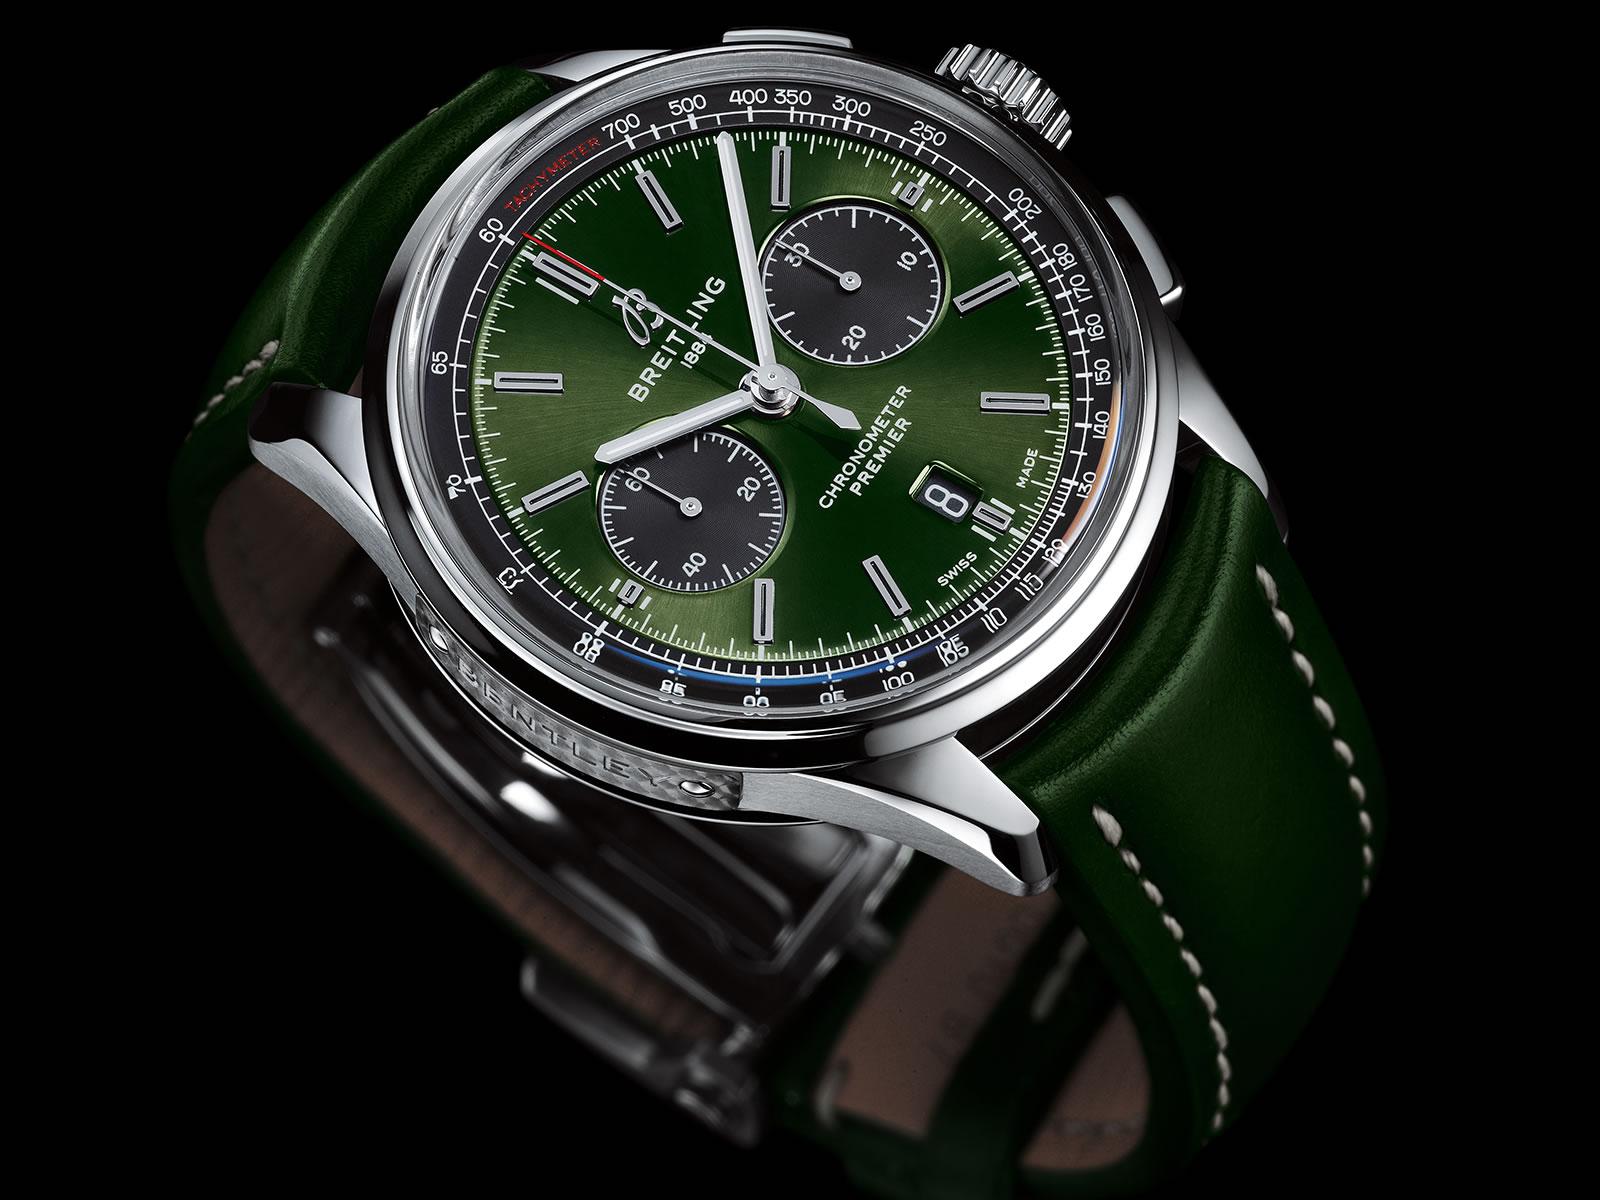 breitling-premier-b01-chronograph-42-bentley-british-racing-green-with-a-british-racing-green-leather-strap-4-.jpg